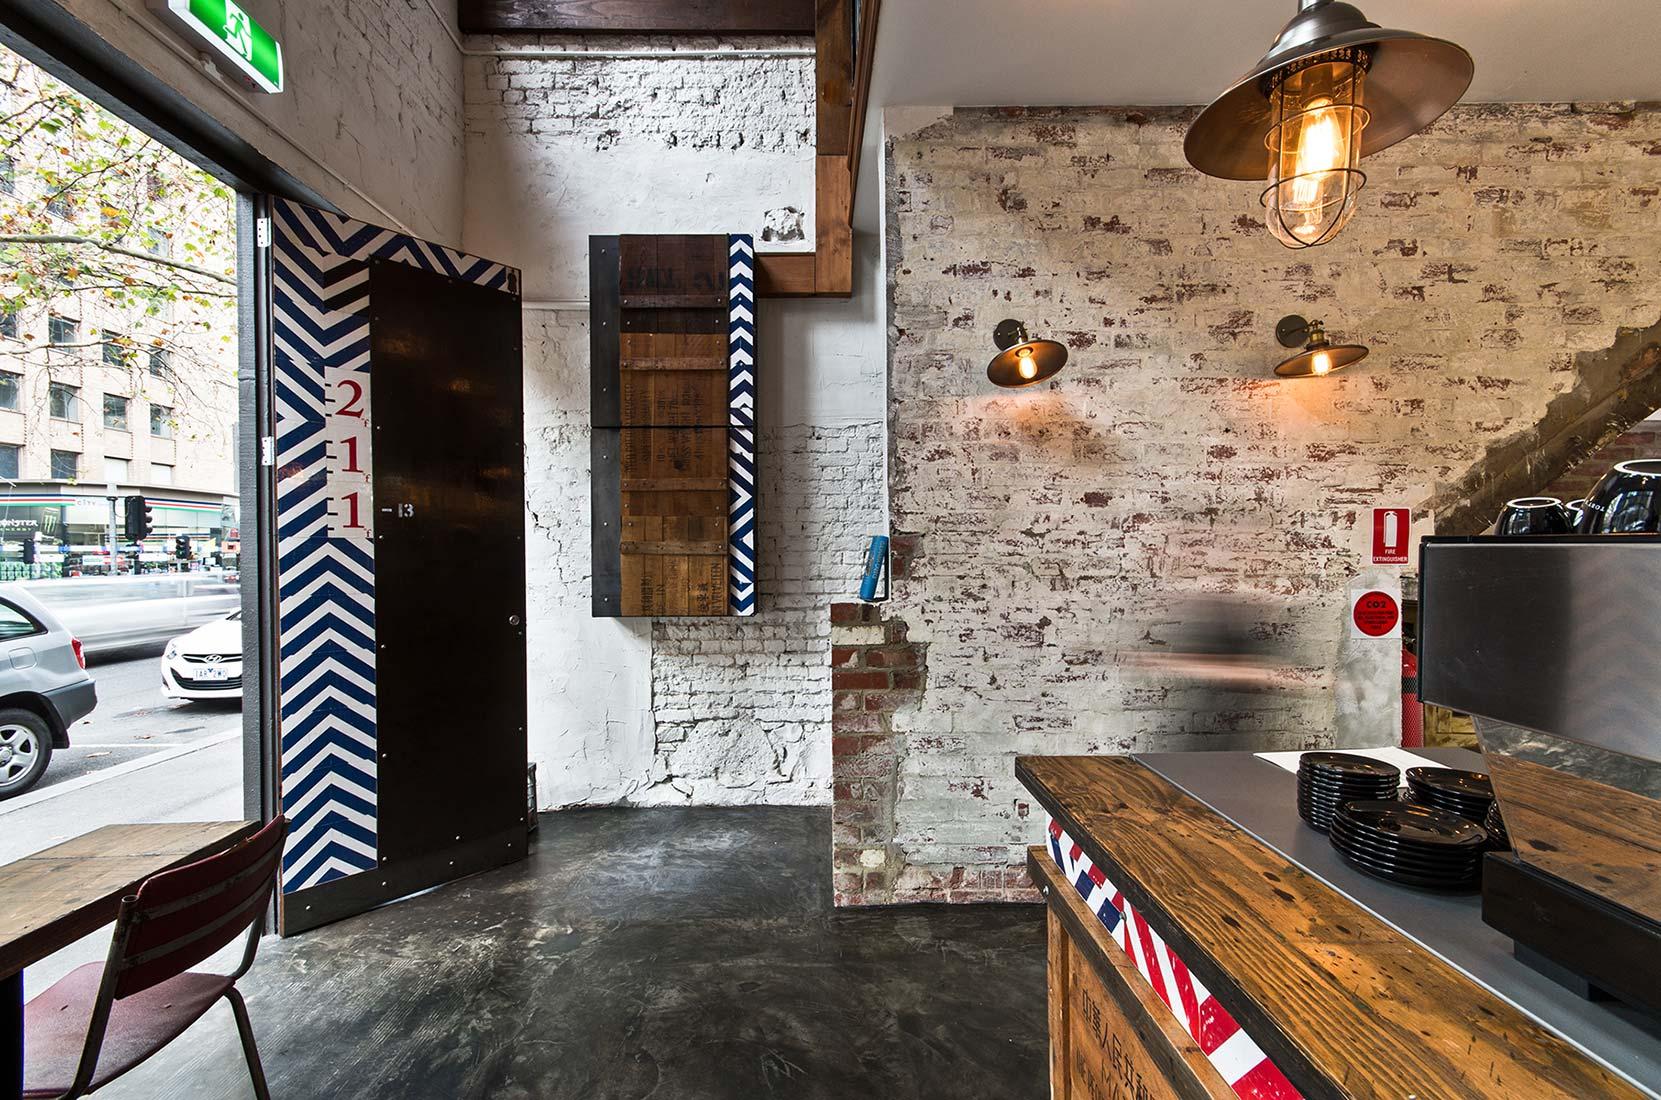 The Deli Counter - interior design by Studio Y.